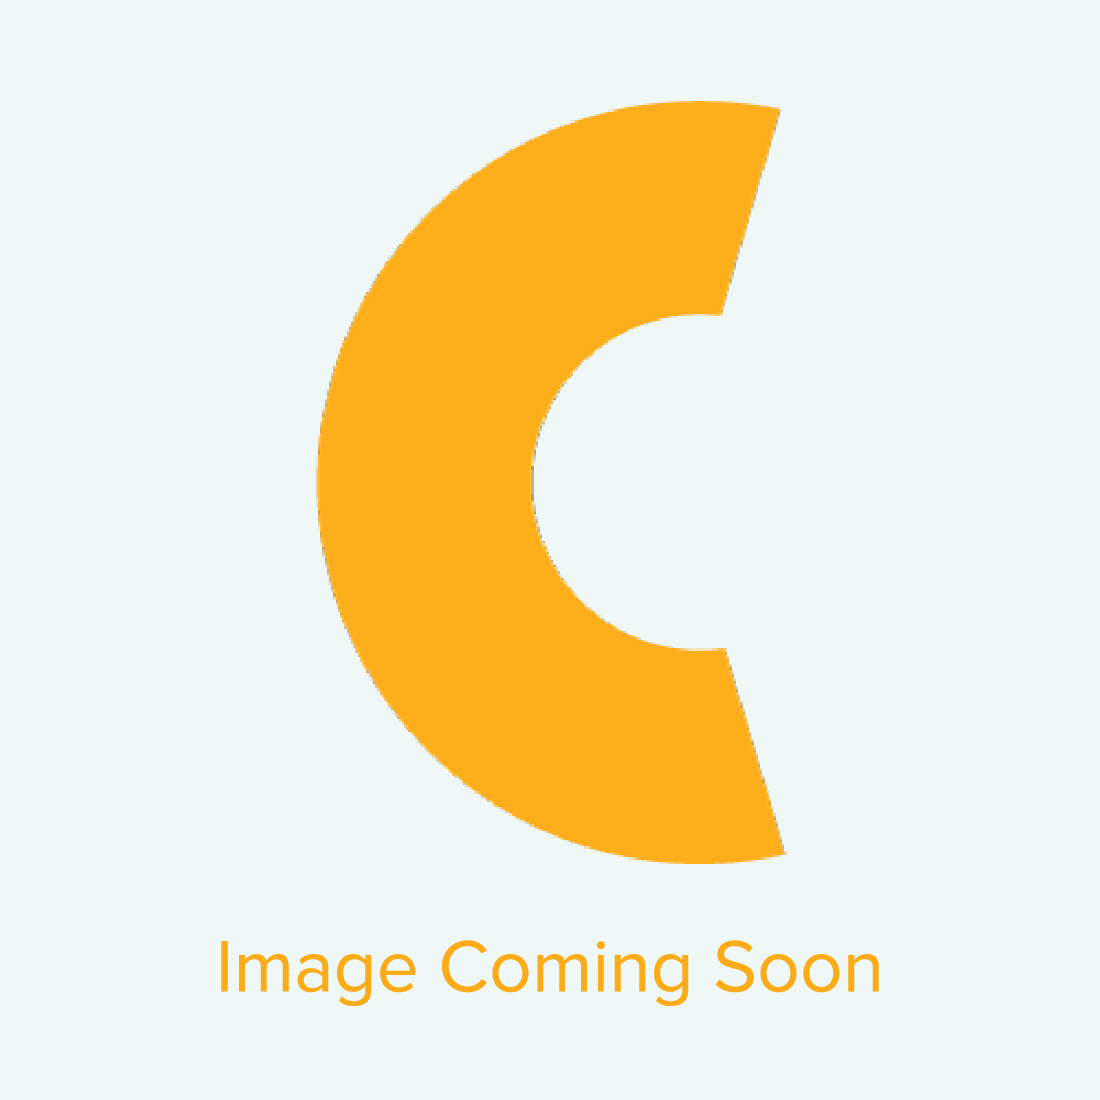 "Easter Bunny Ears Patterned Heat Transfer Vinyl Sheets - 12"" x 19"""